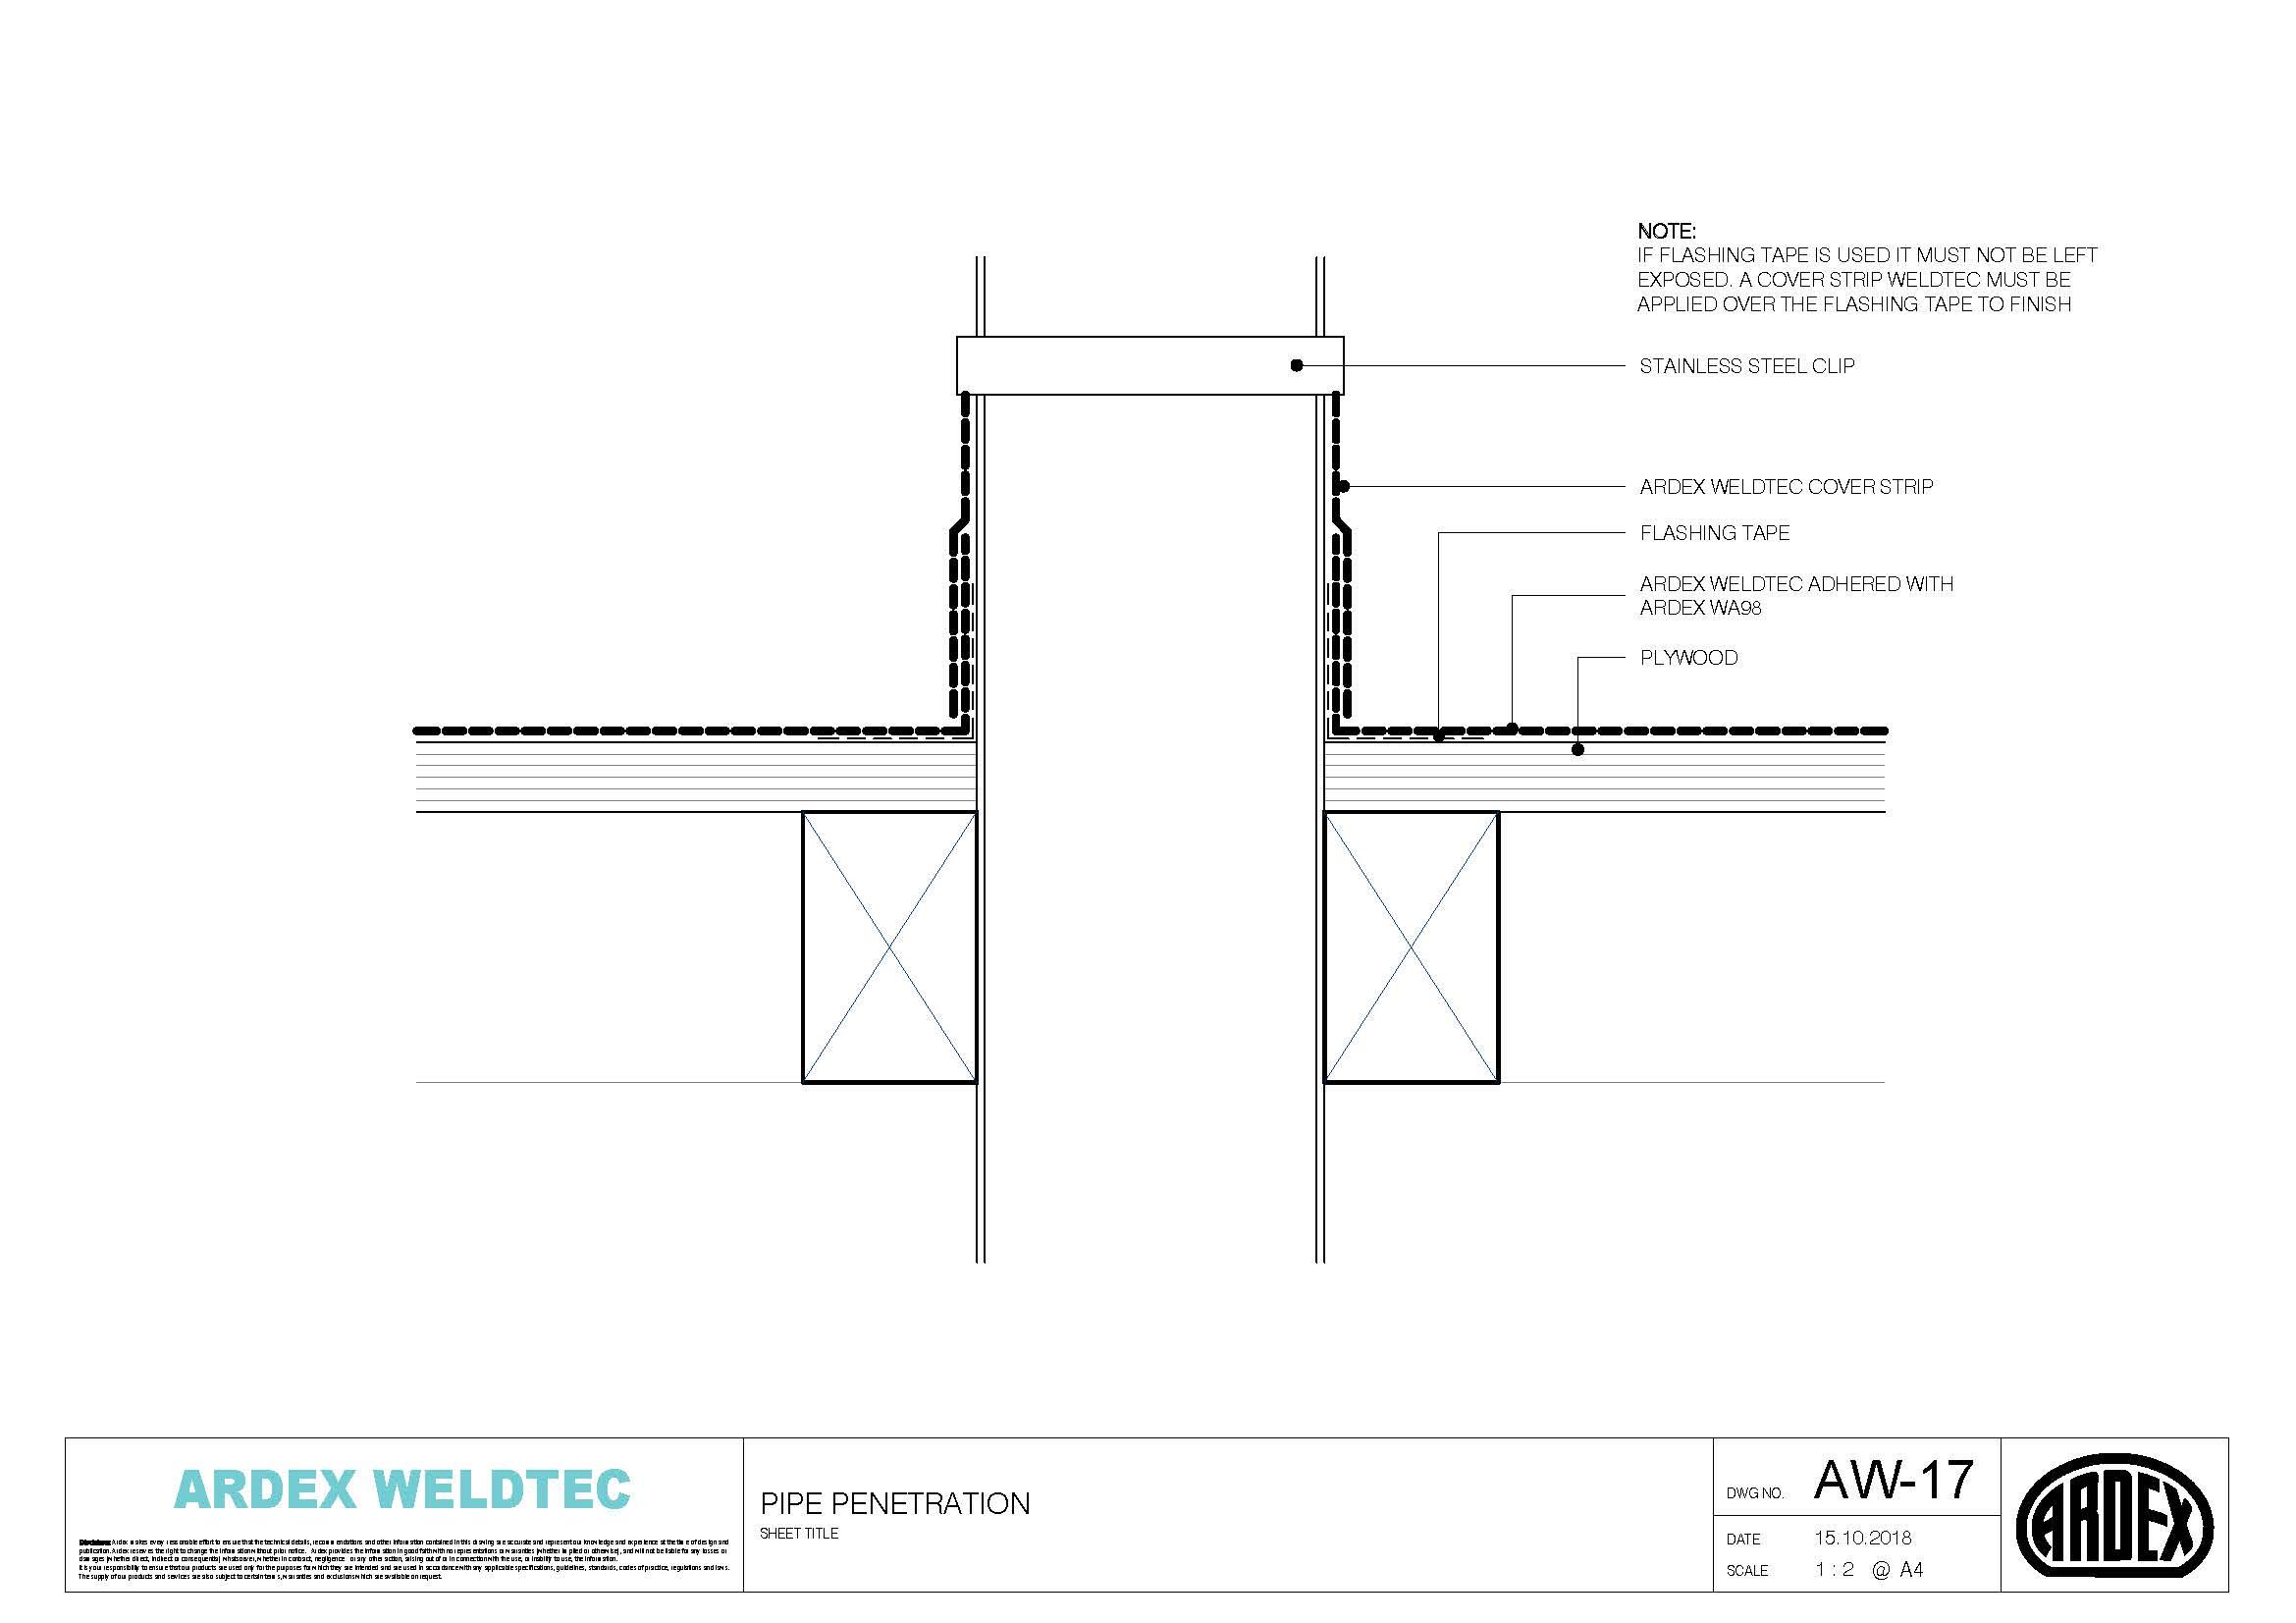 Weldtec pipe presentation